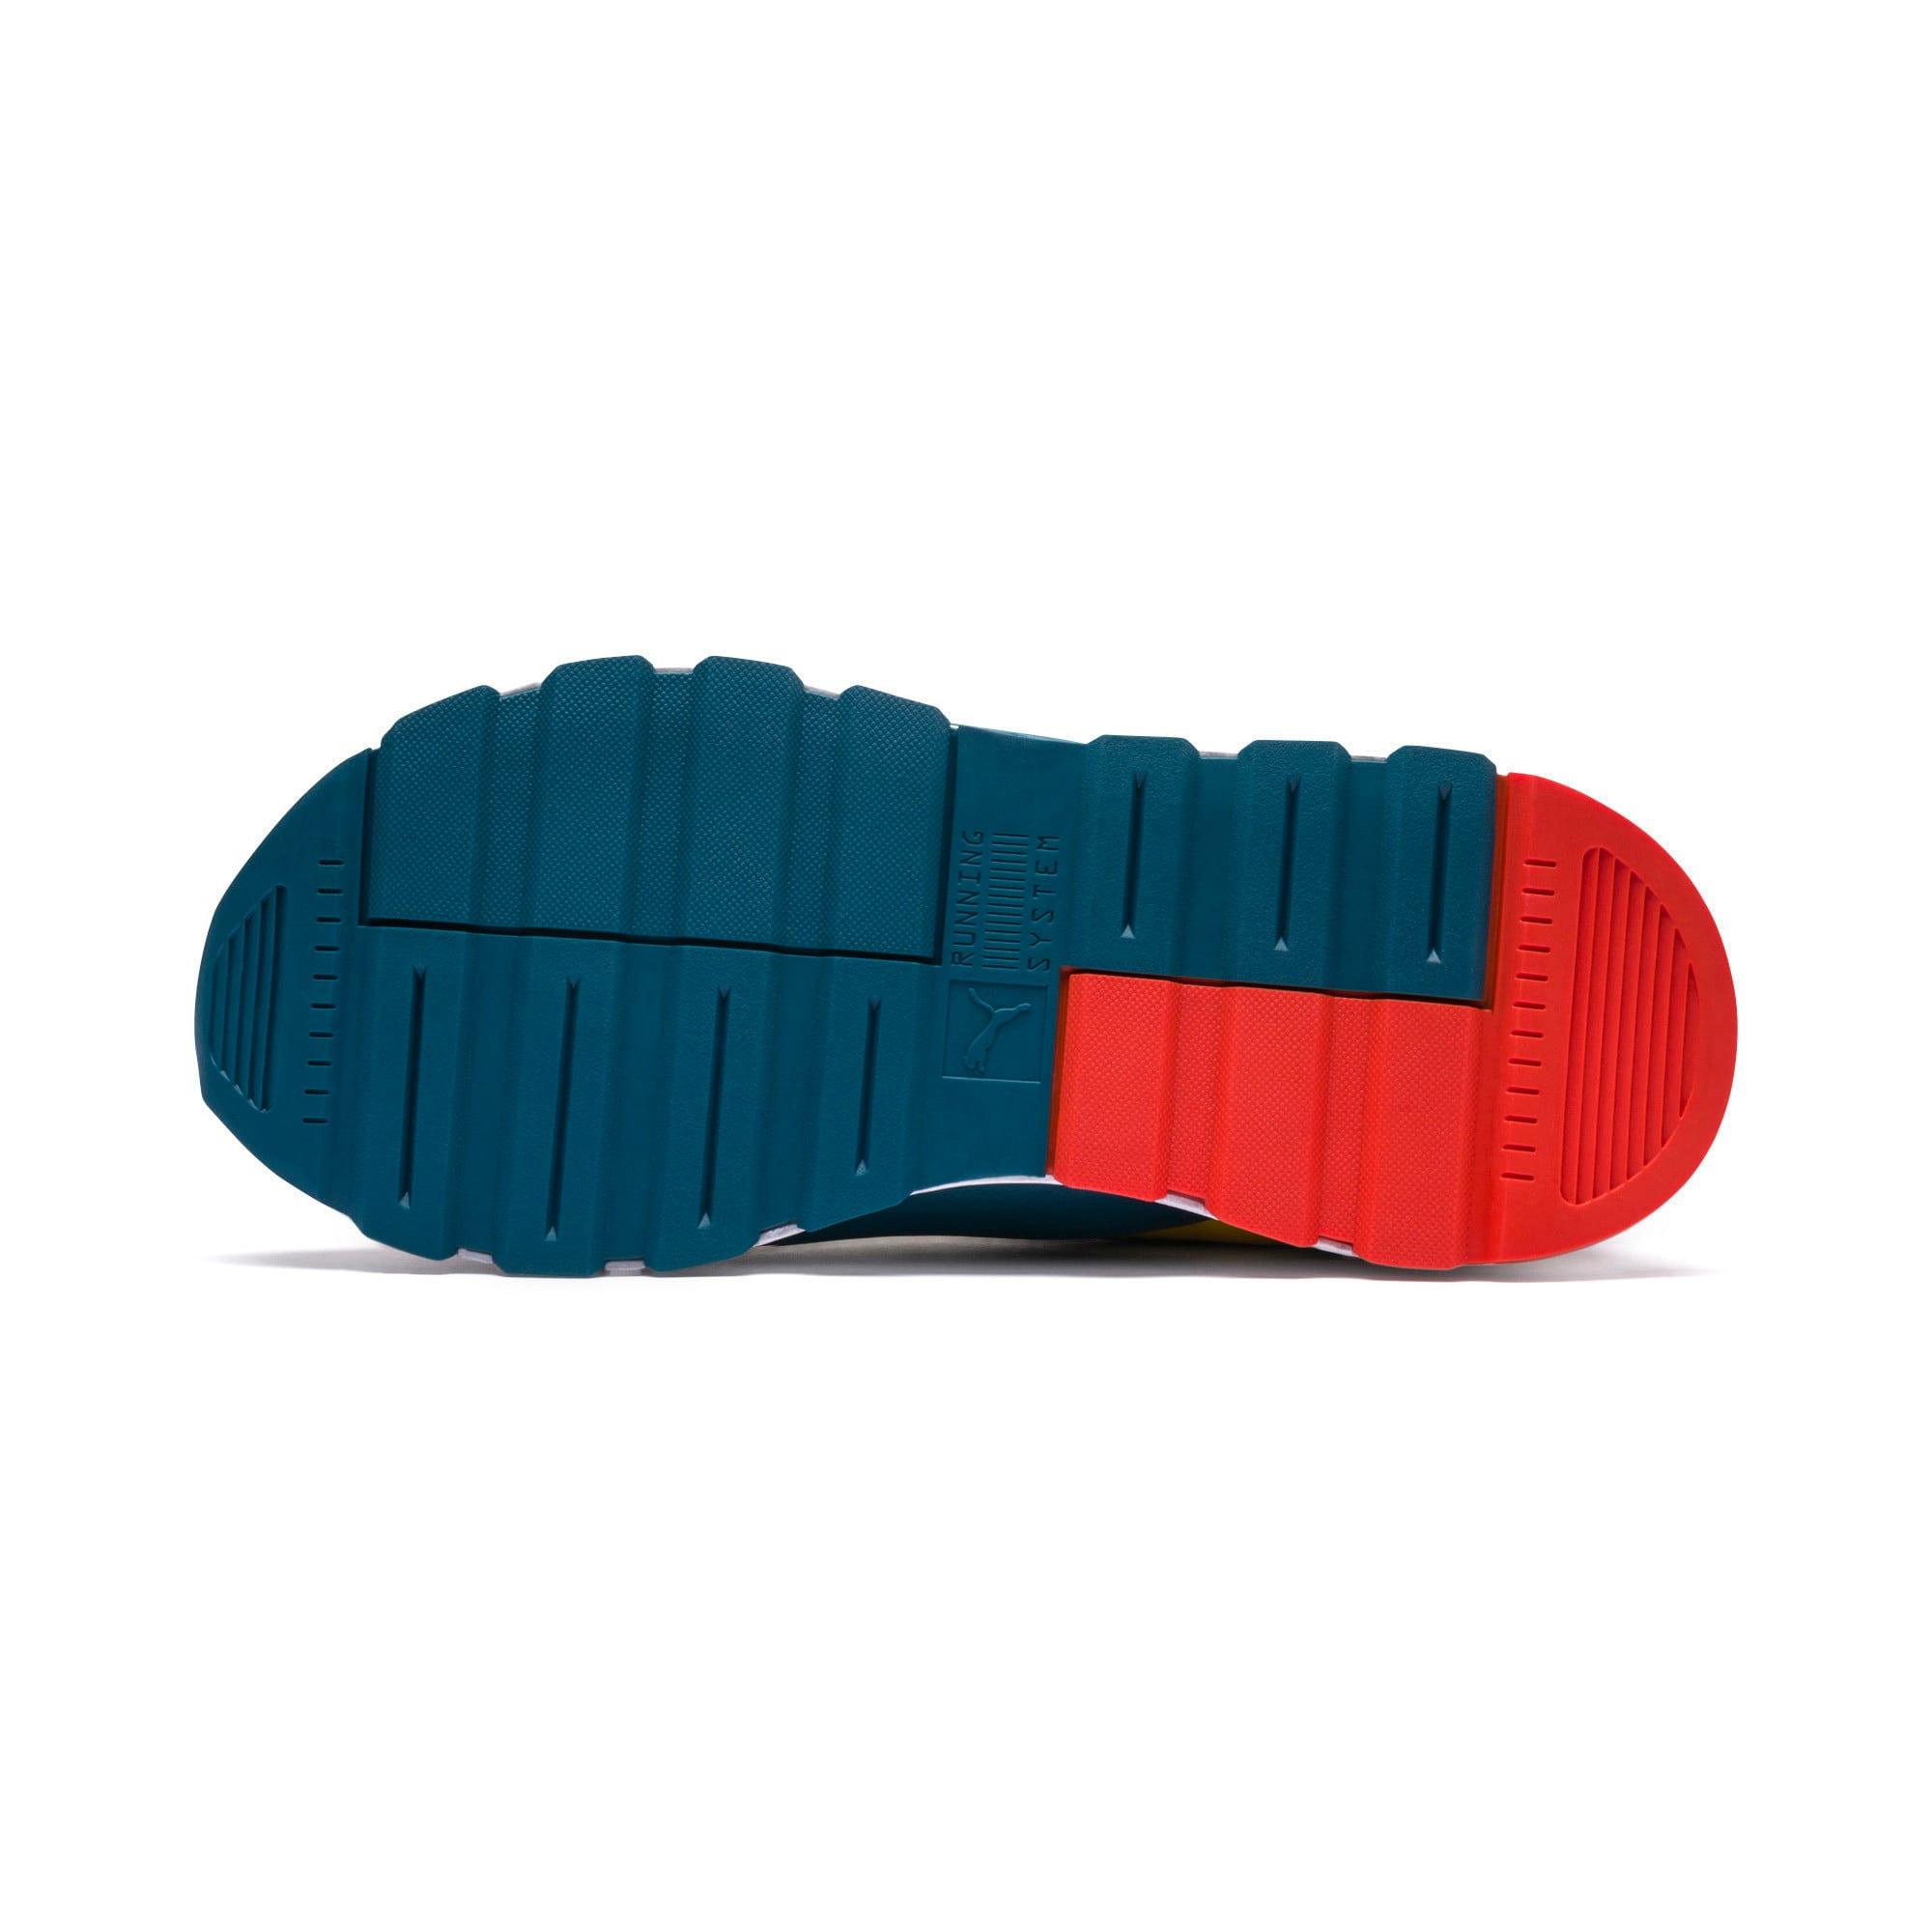 Thumbnail 4 of Sesame Street 50 RS-0 Little Kids' Shoes, Rose-Blue Coral-Dandelion, medium